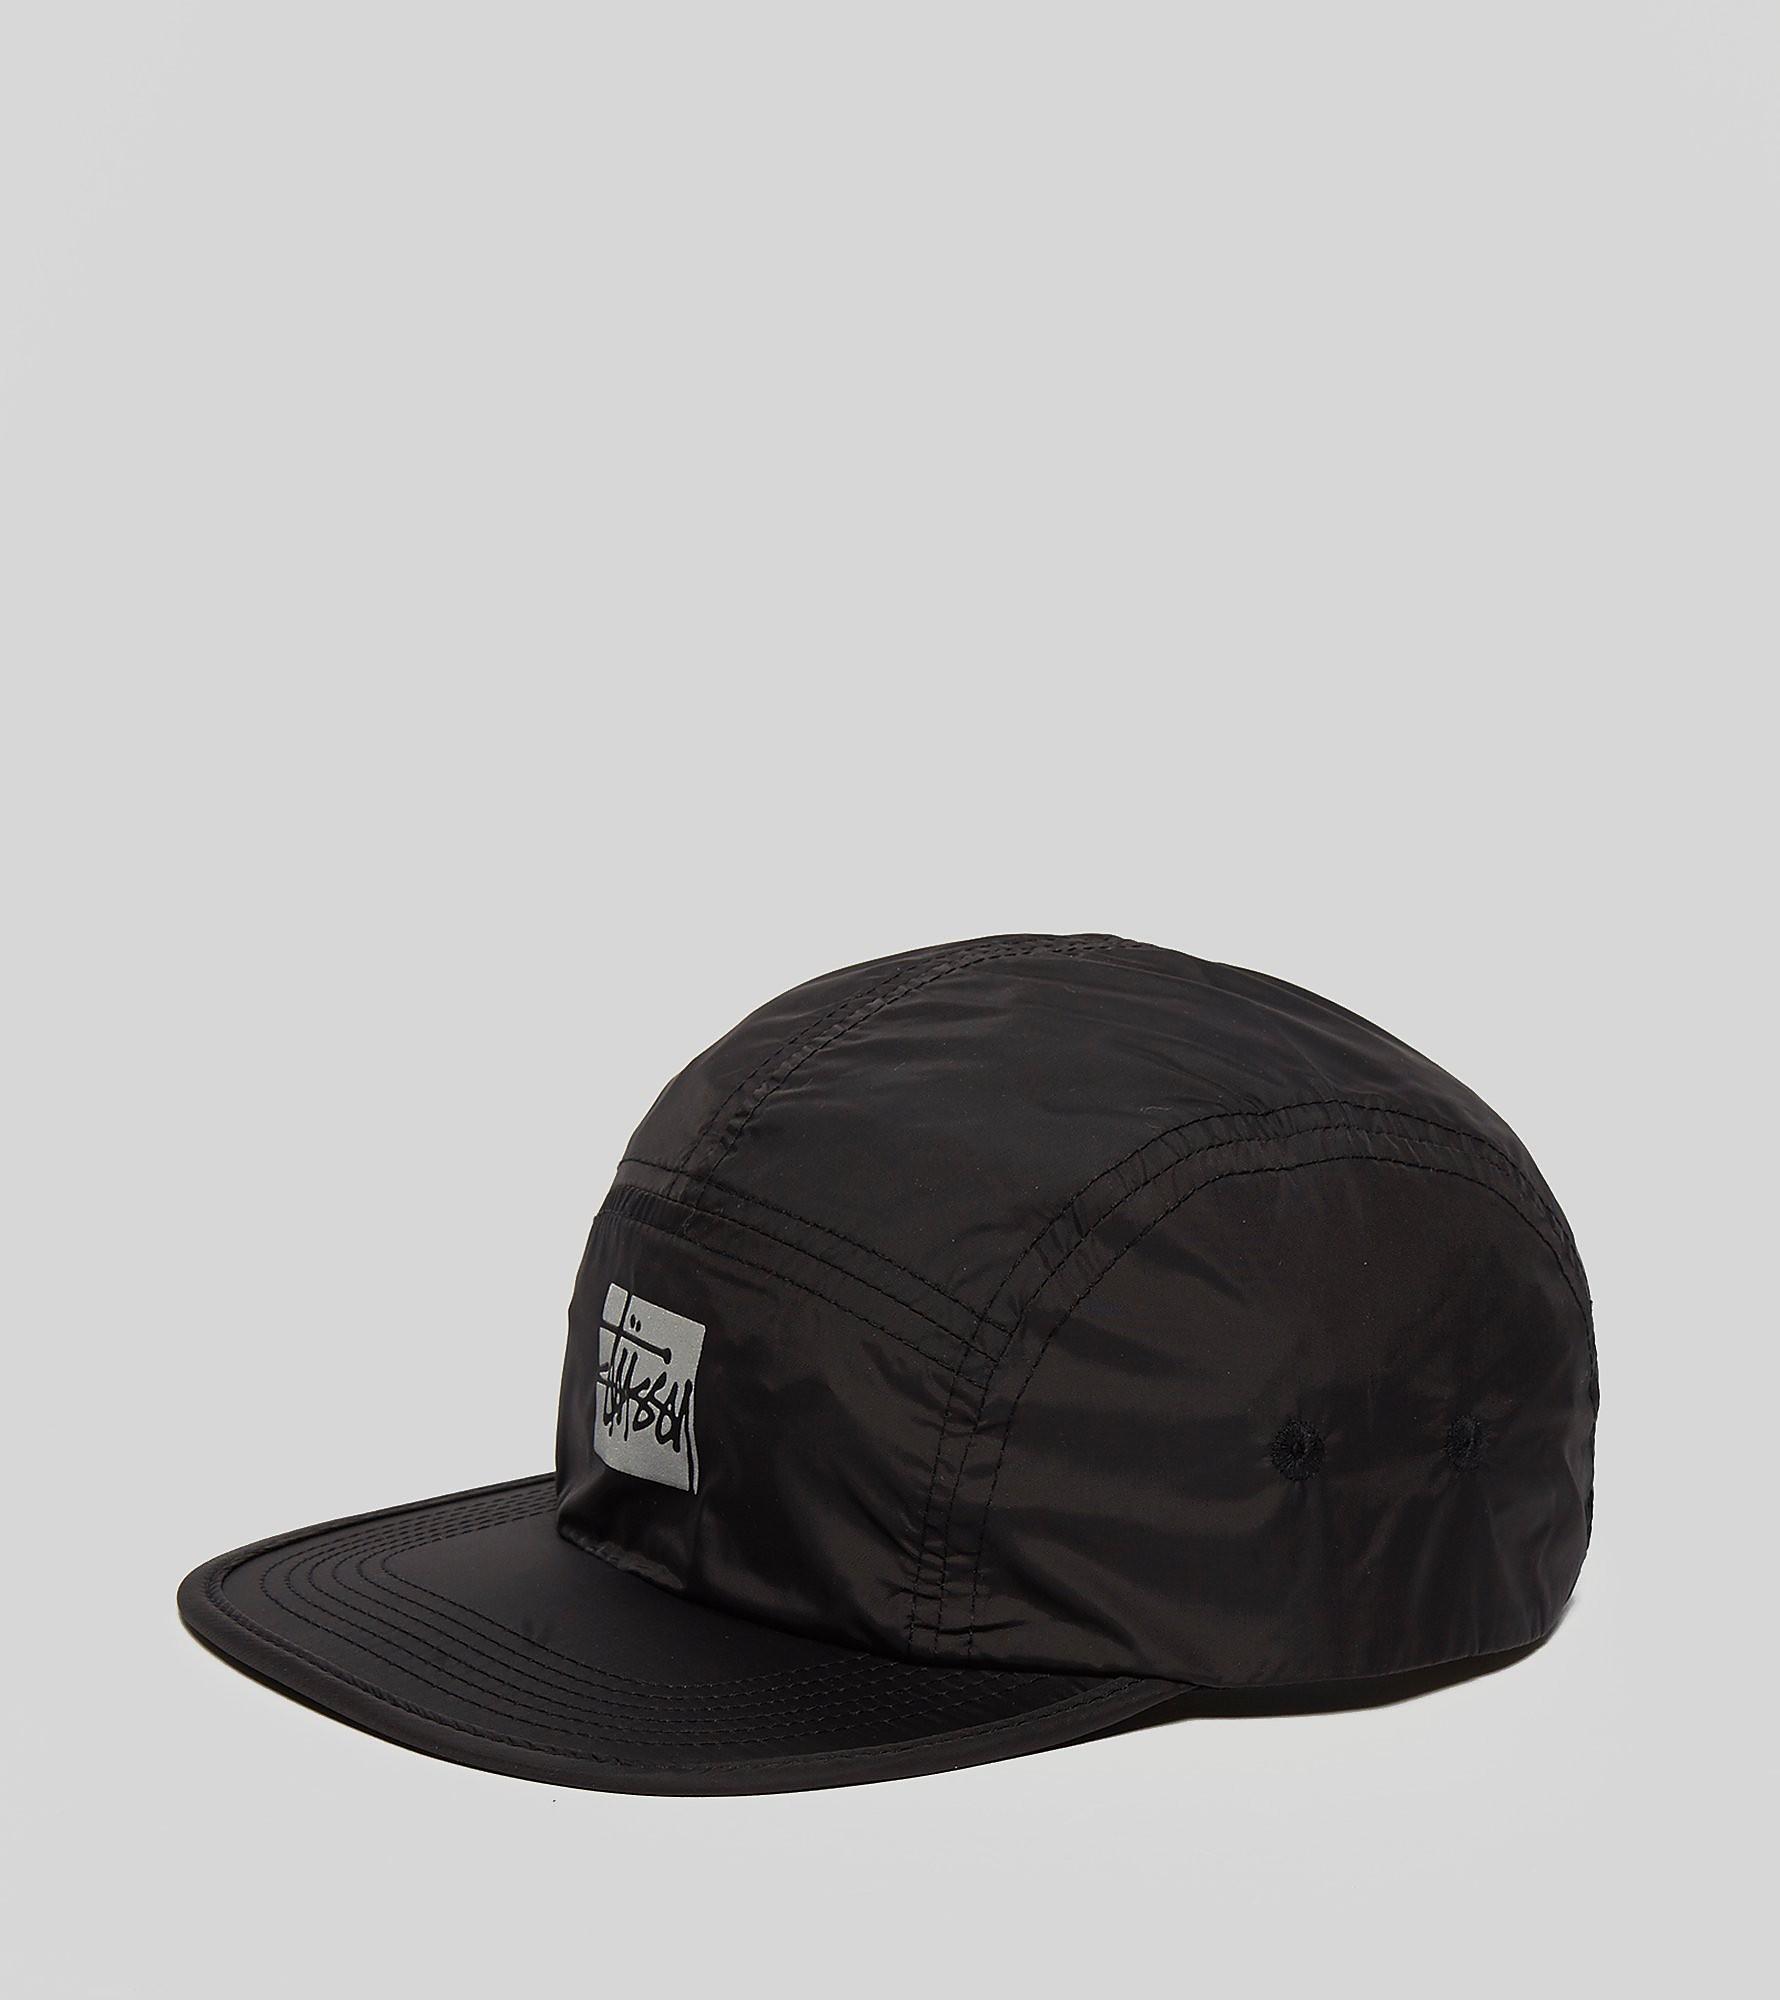 Stussy Reflective Strapback Cap